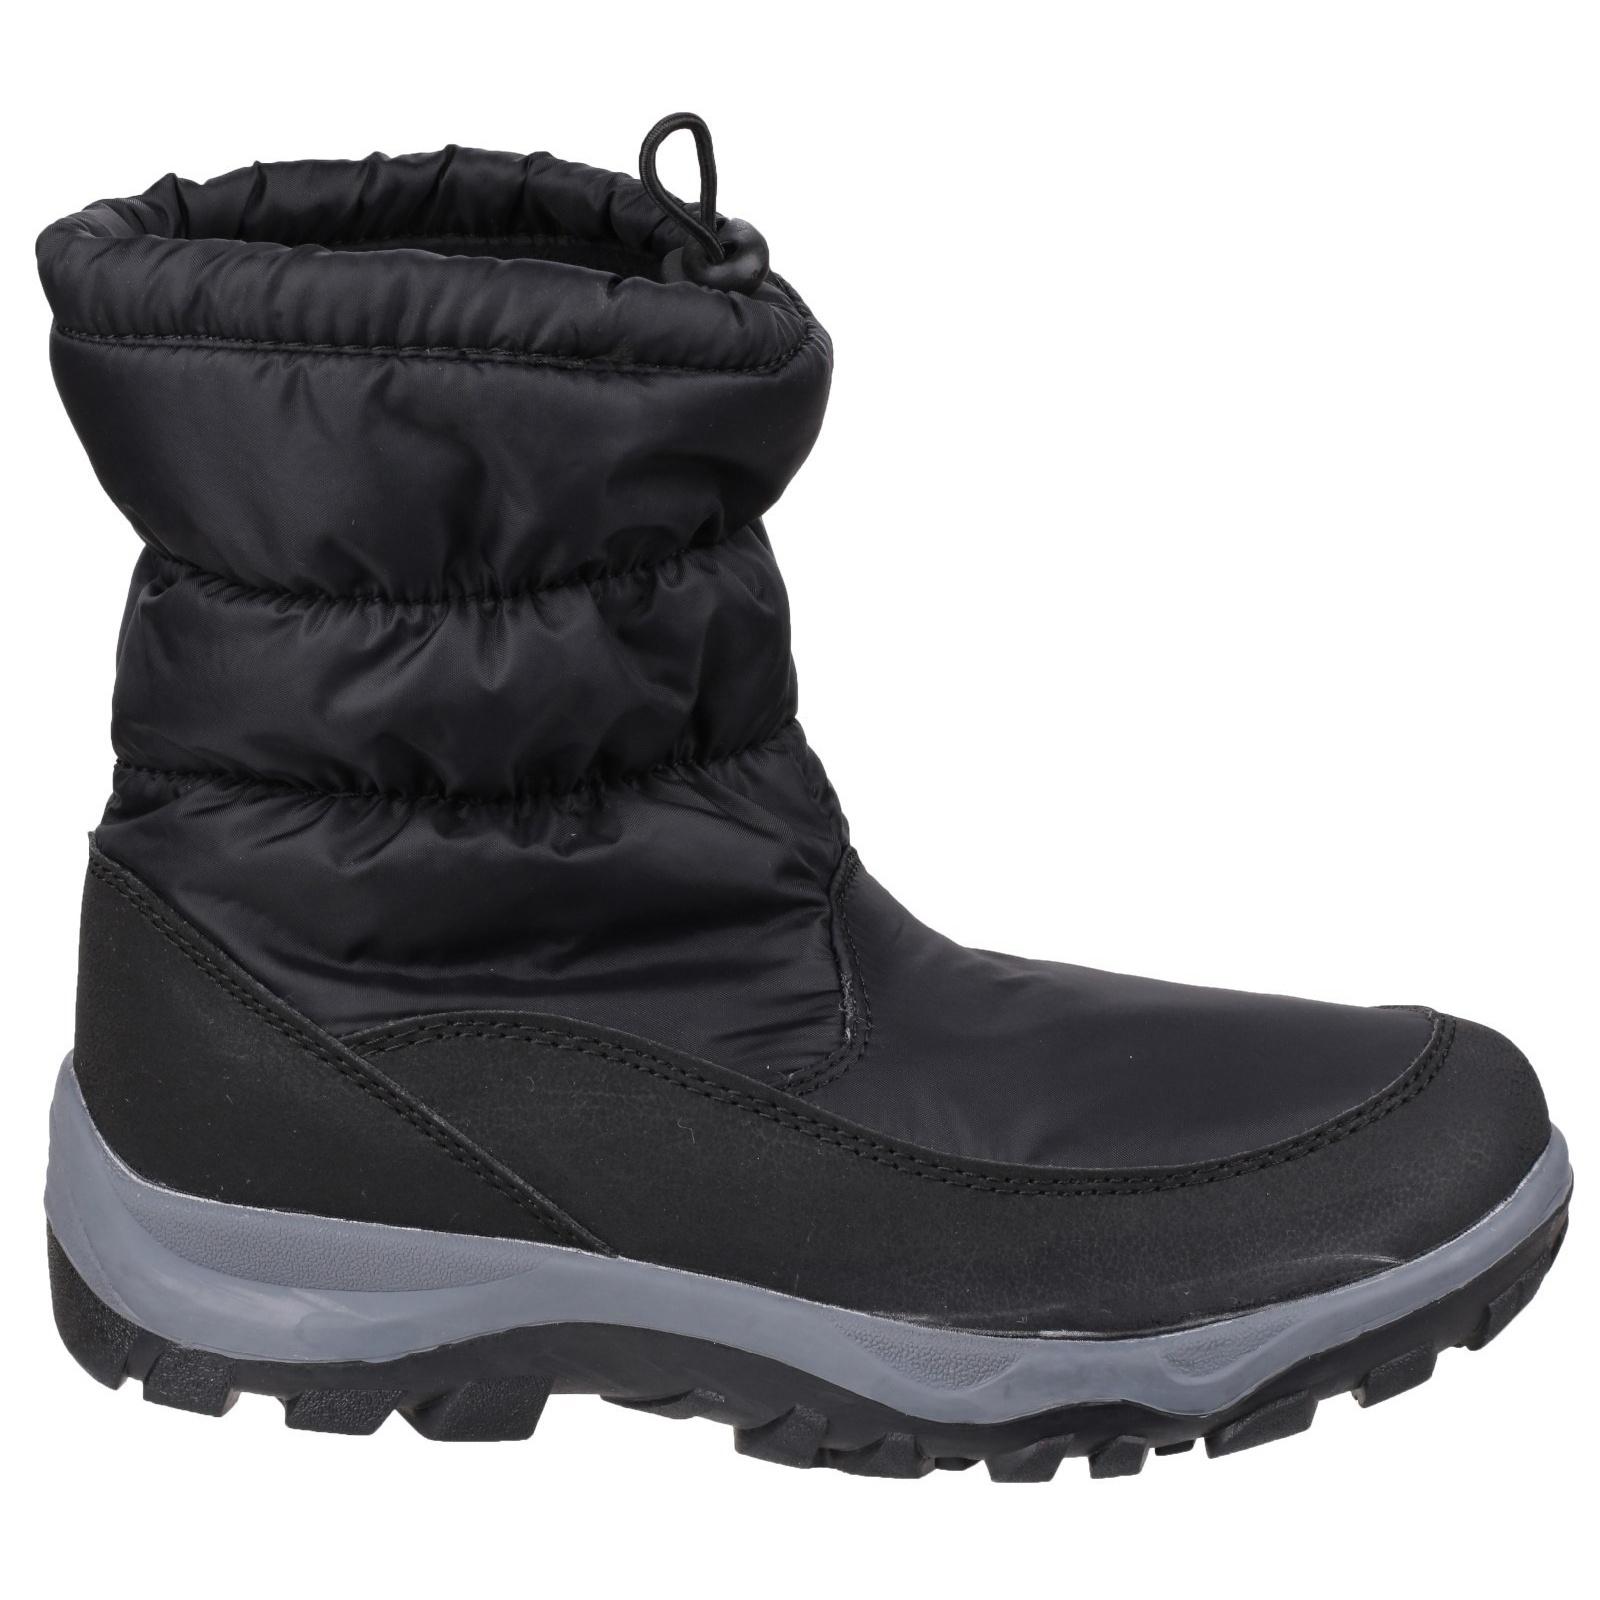 Cotswold - Botas para la nieve impermeables modelo Polar para mujer (FS2868)